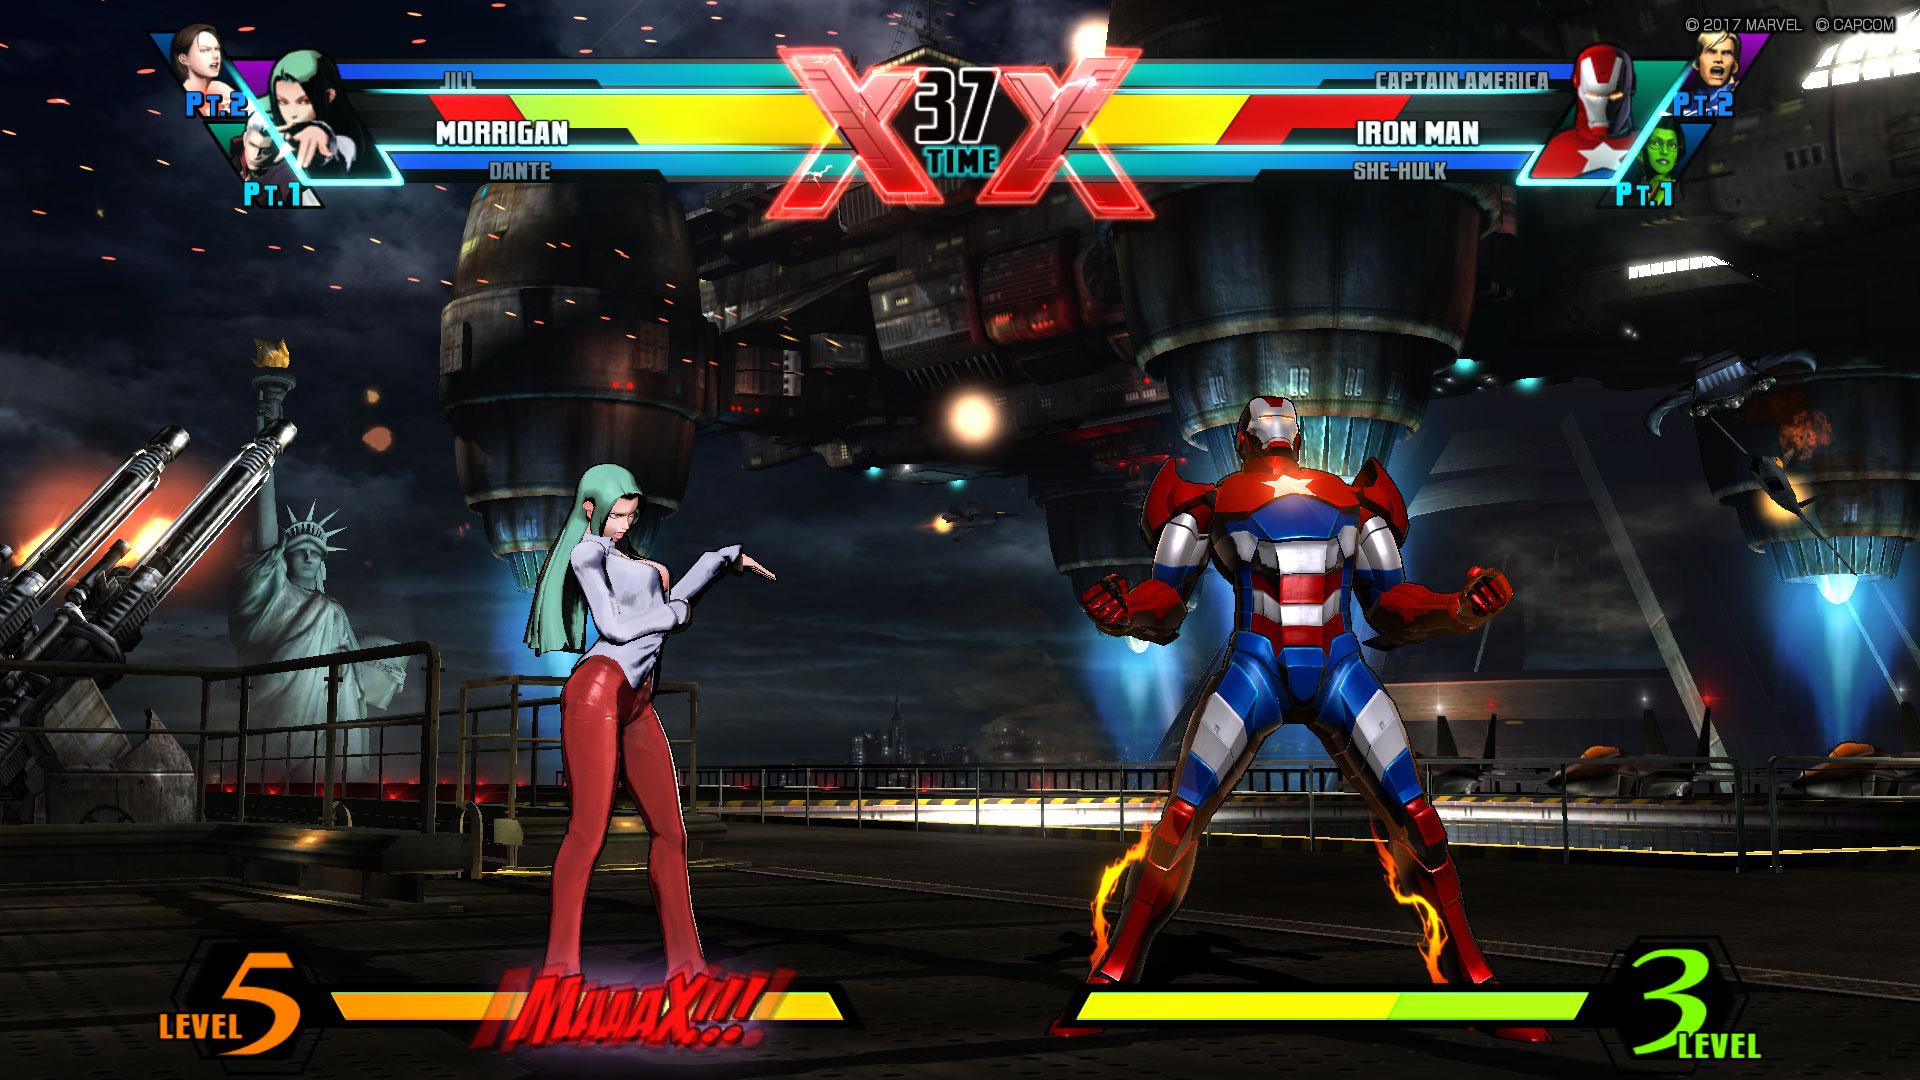 Ultimate Marvel Vs Capcom 3 On Steam